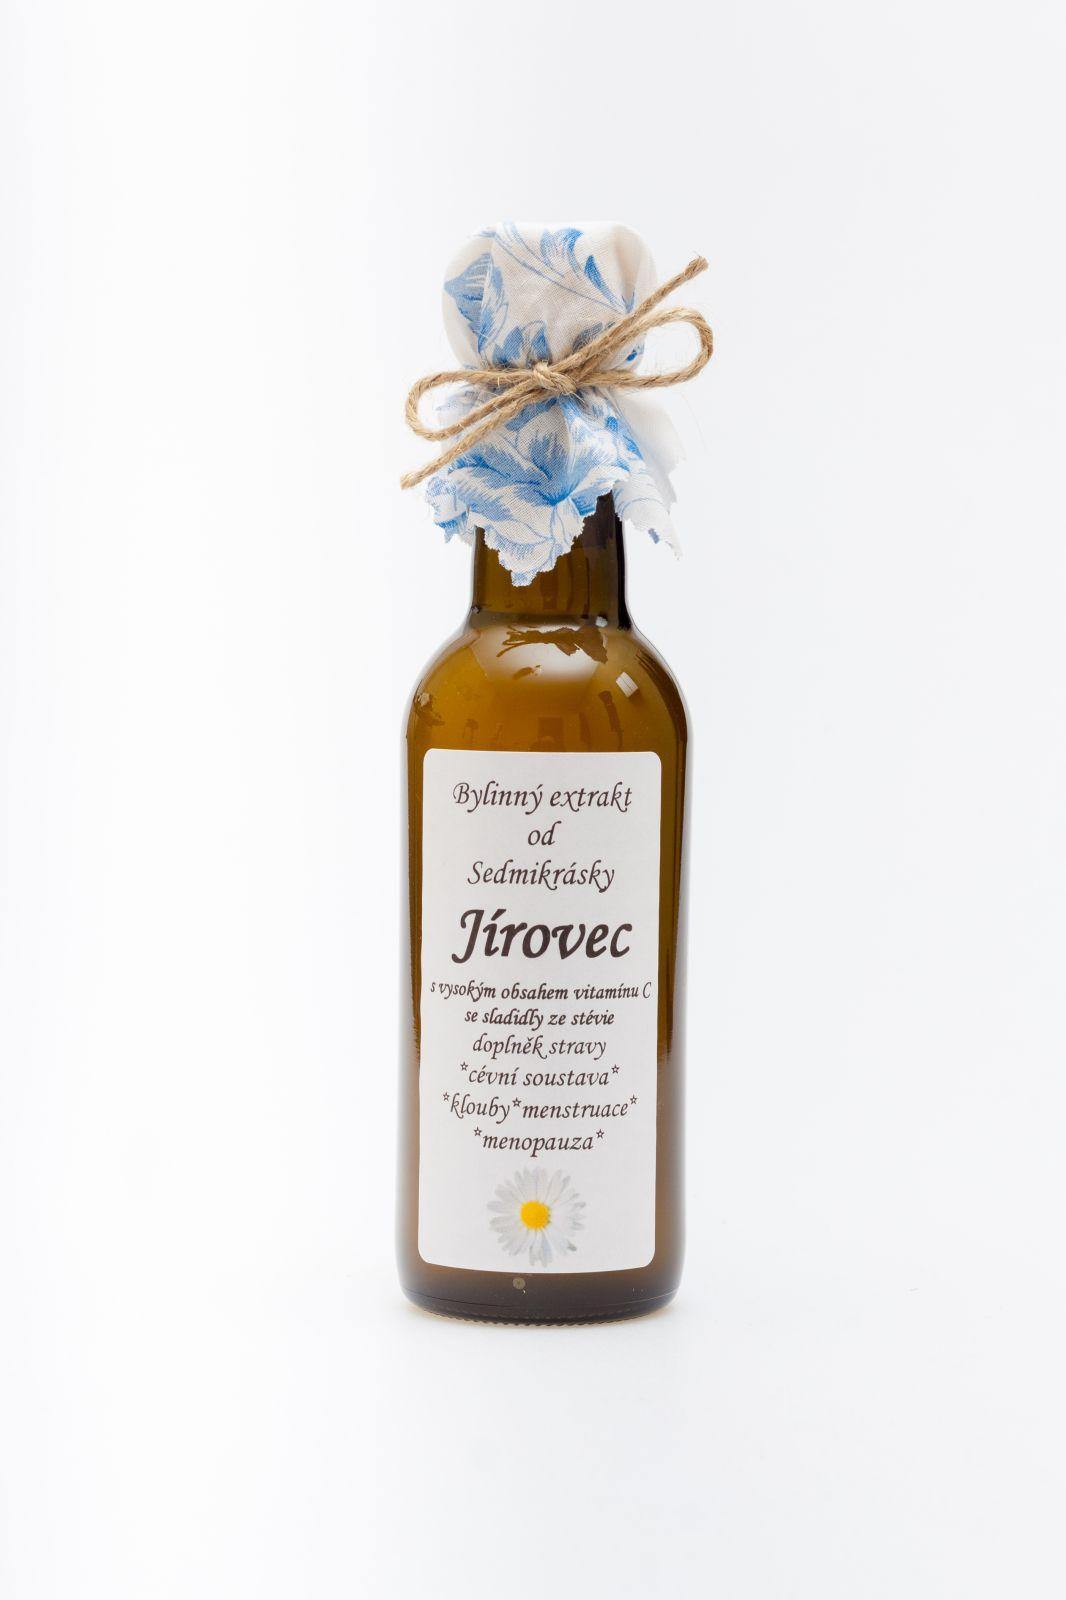 Sedmikráska bylinný extrakt Pagaštan 250ml cévní soustava, antioxidant, klouby, menstruace a menopauza doplněk stravy Rodinná farma Sedmikráska